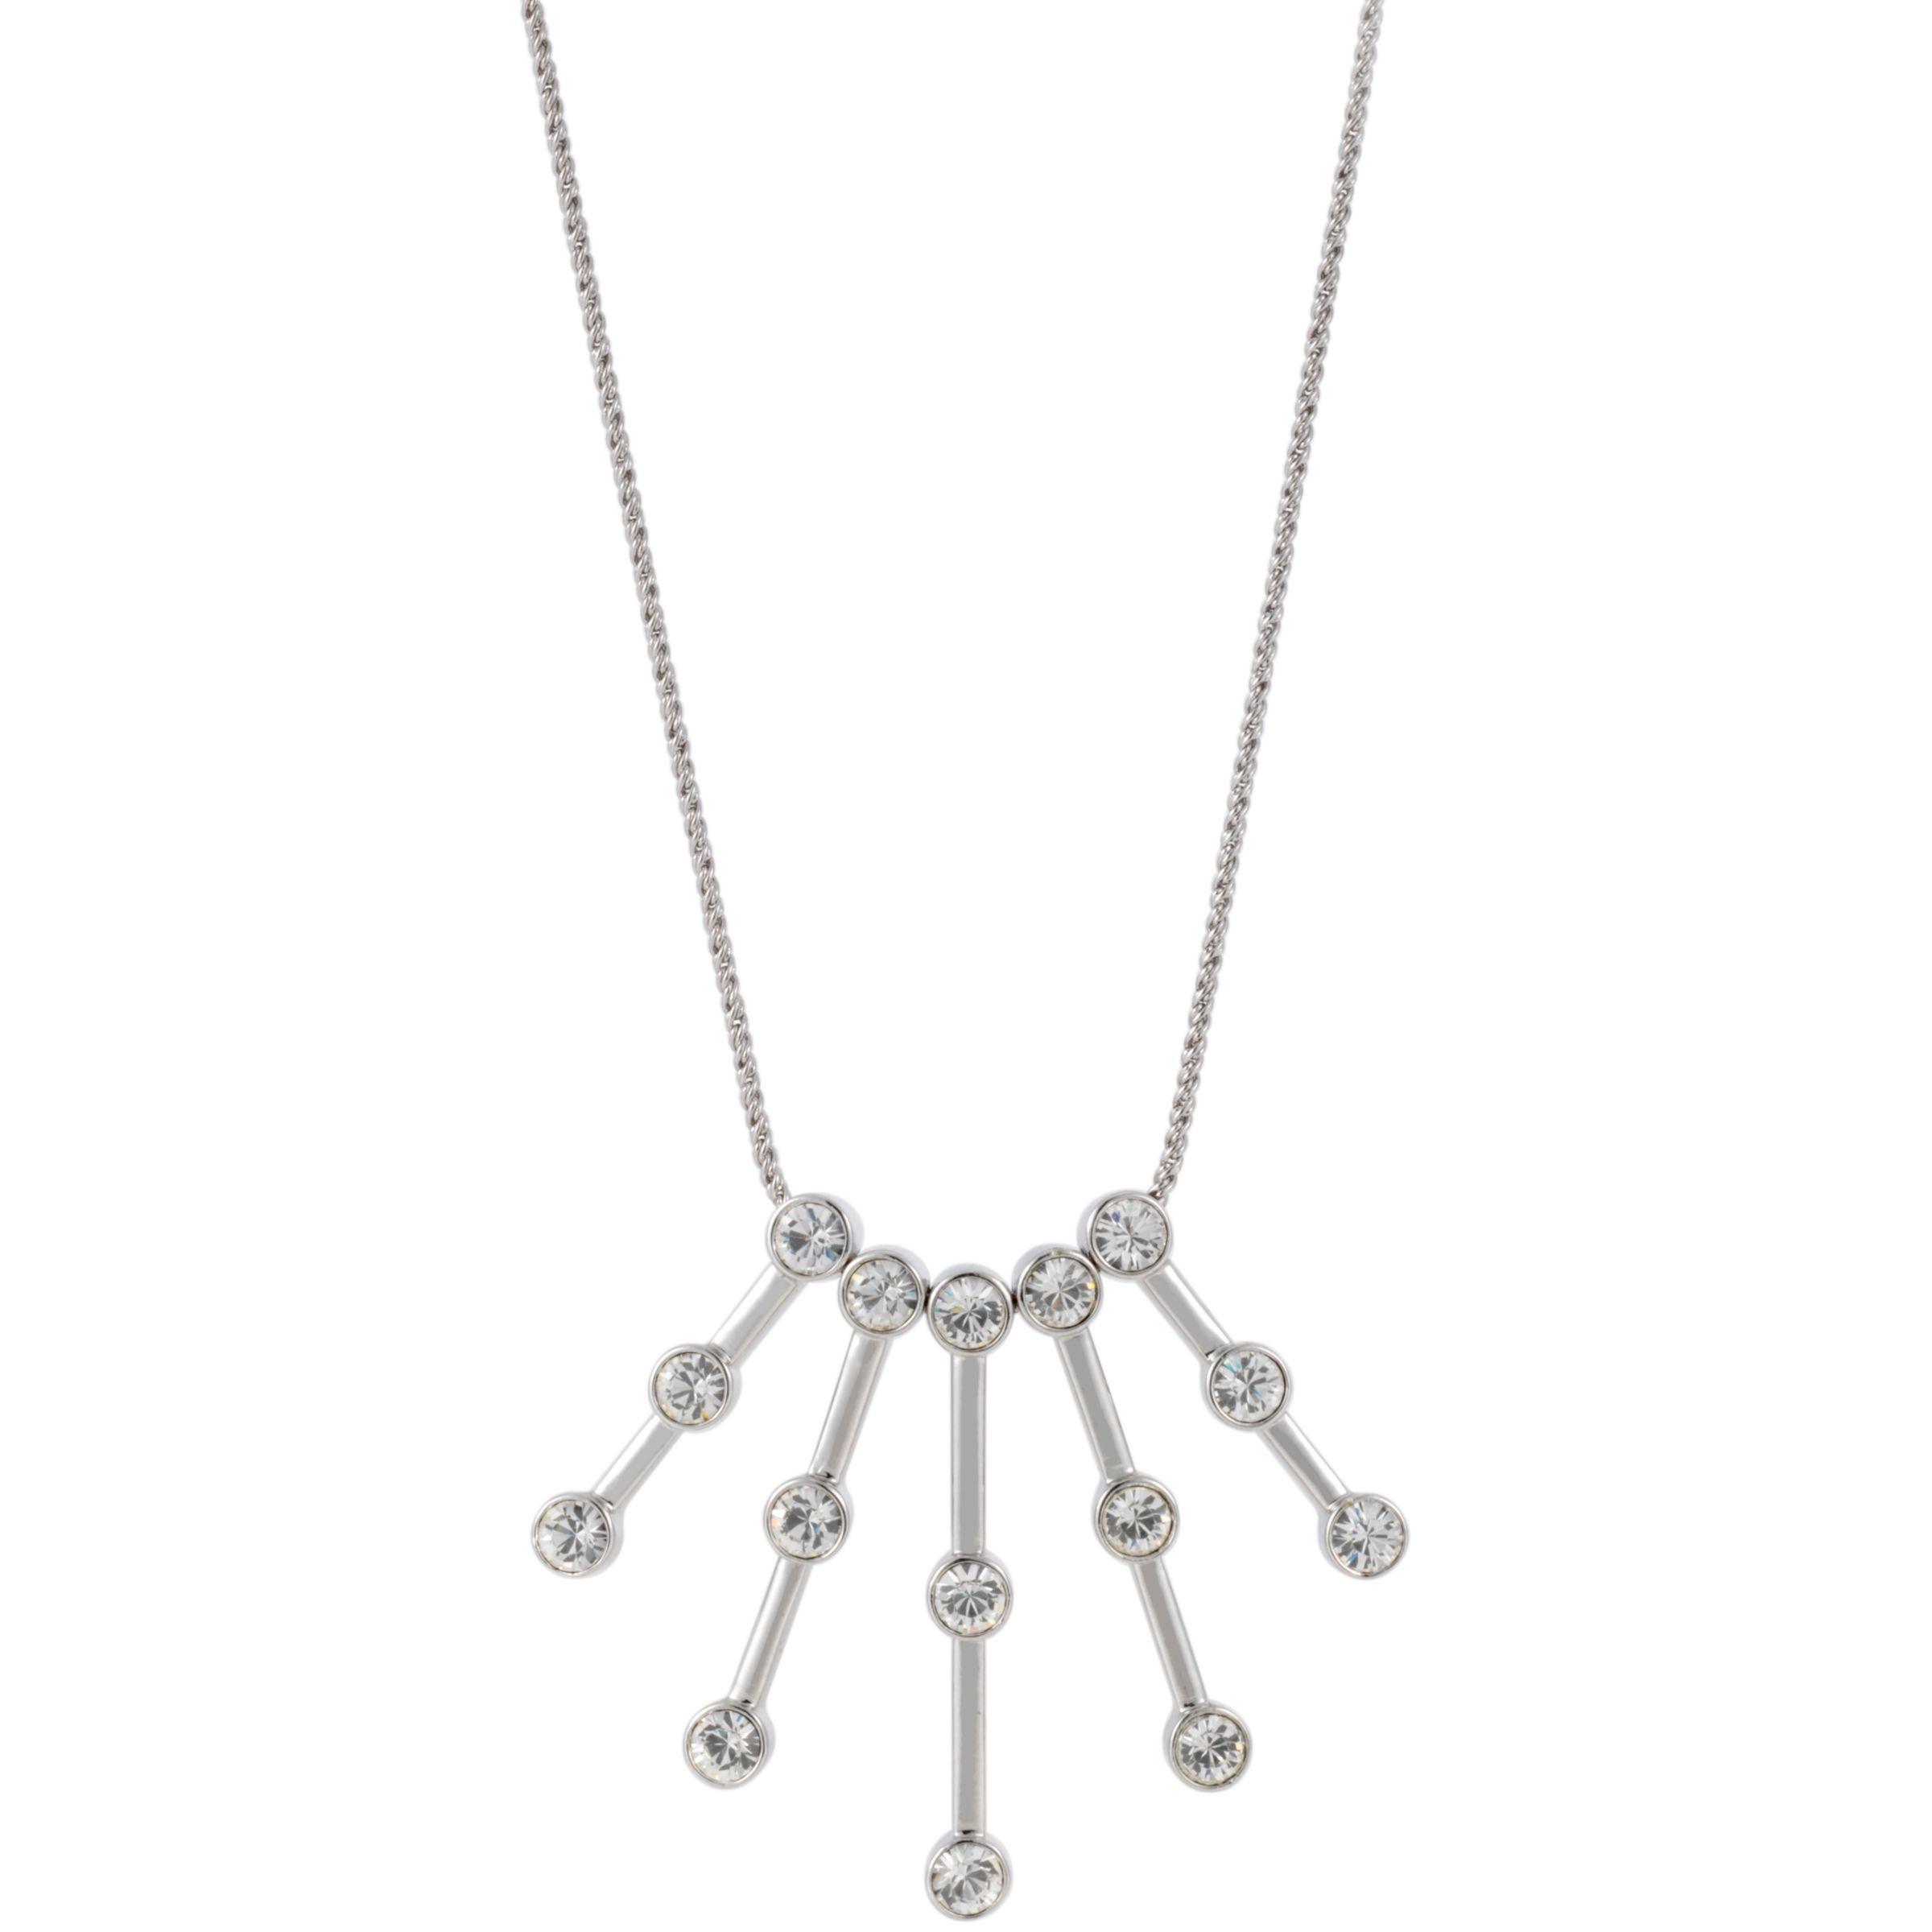 Cachet London Lanai Graduated Drop Necklace